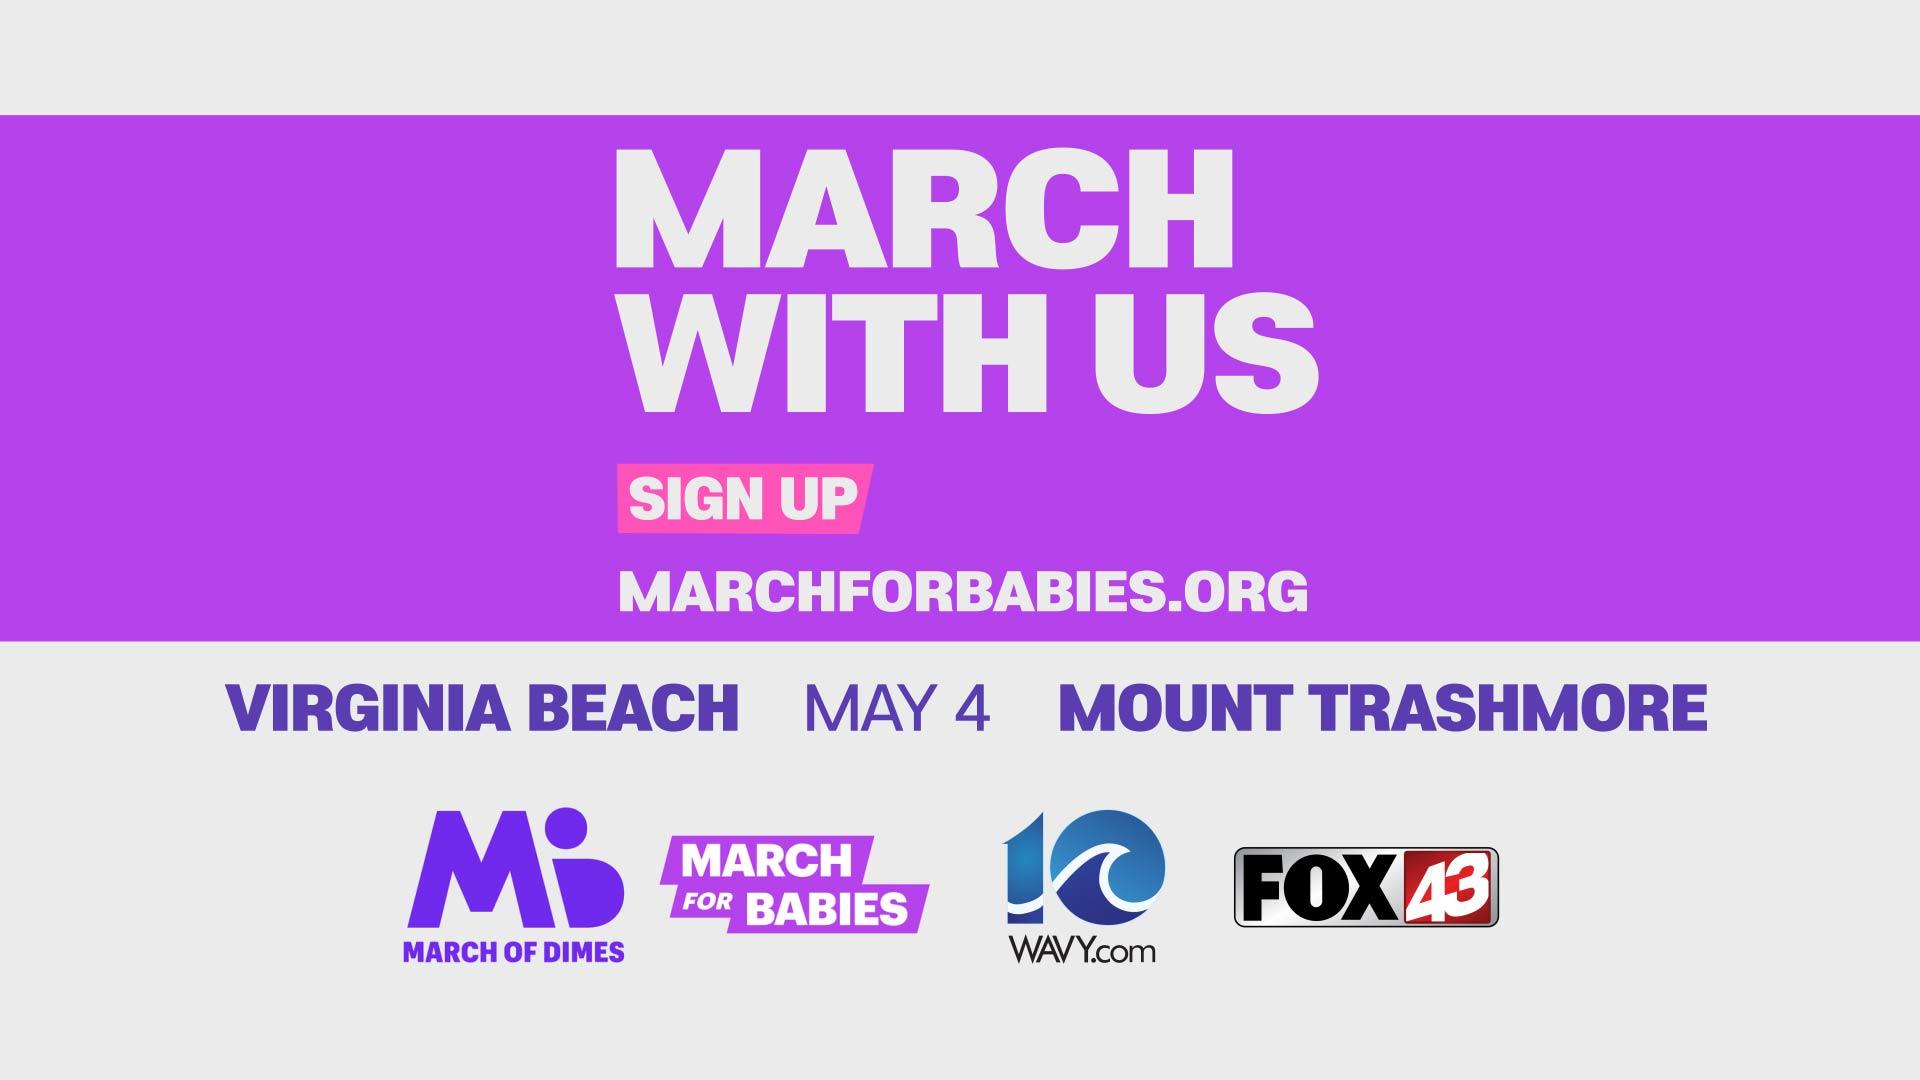 march-w-us-2019-end-board_1554754128016.jpg